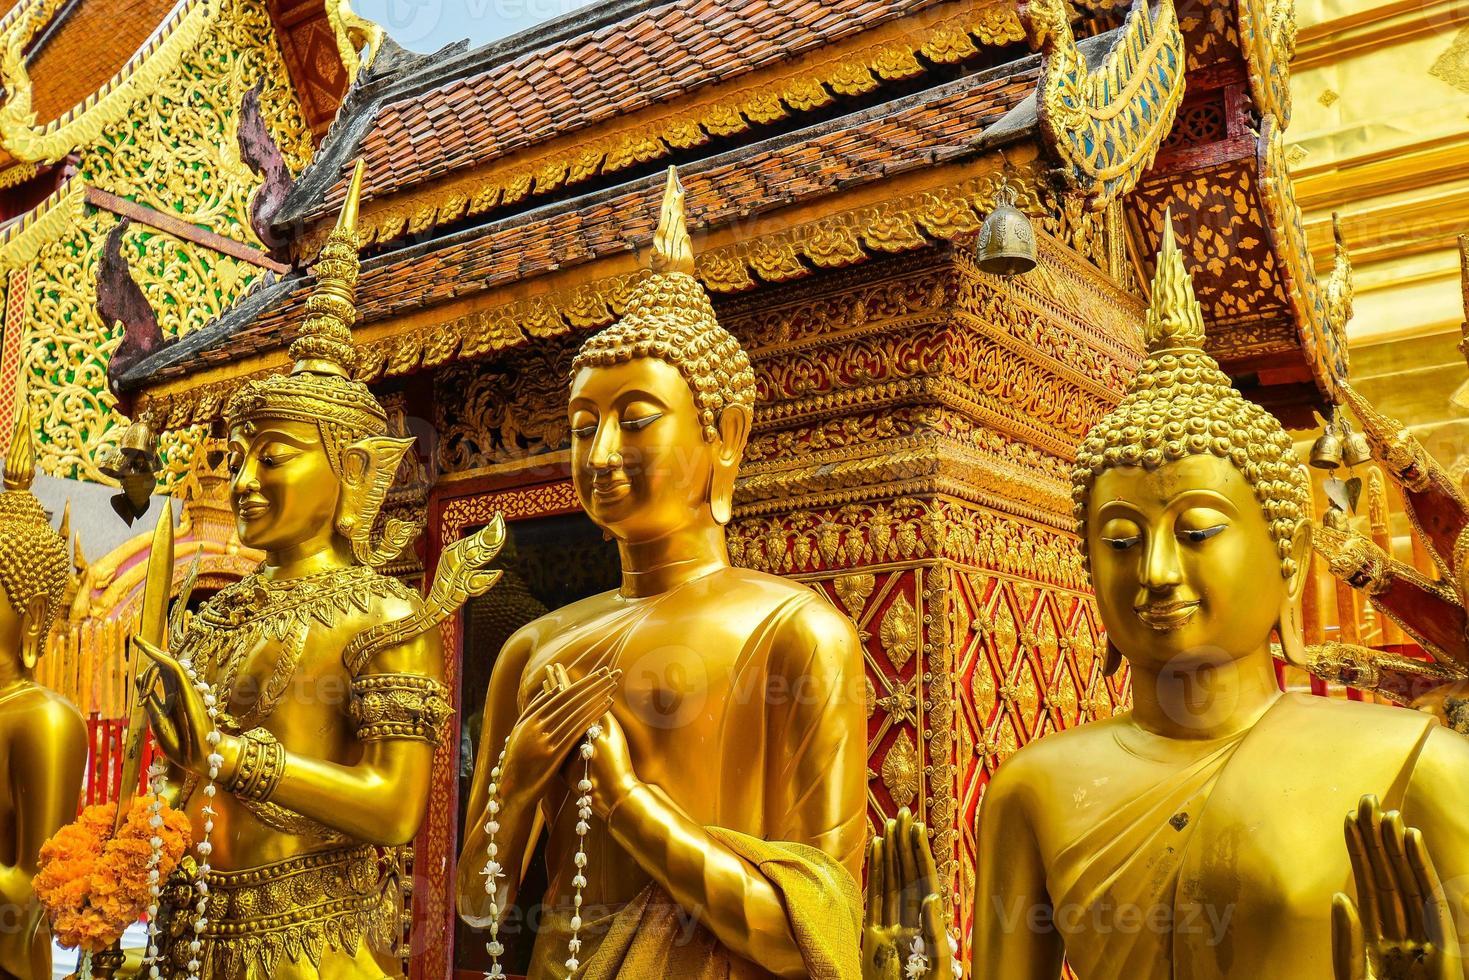 Buddha Statues in Wat Phra That Doi Suthep photo